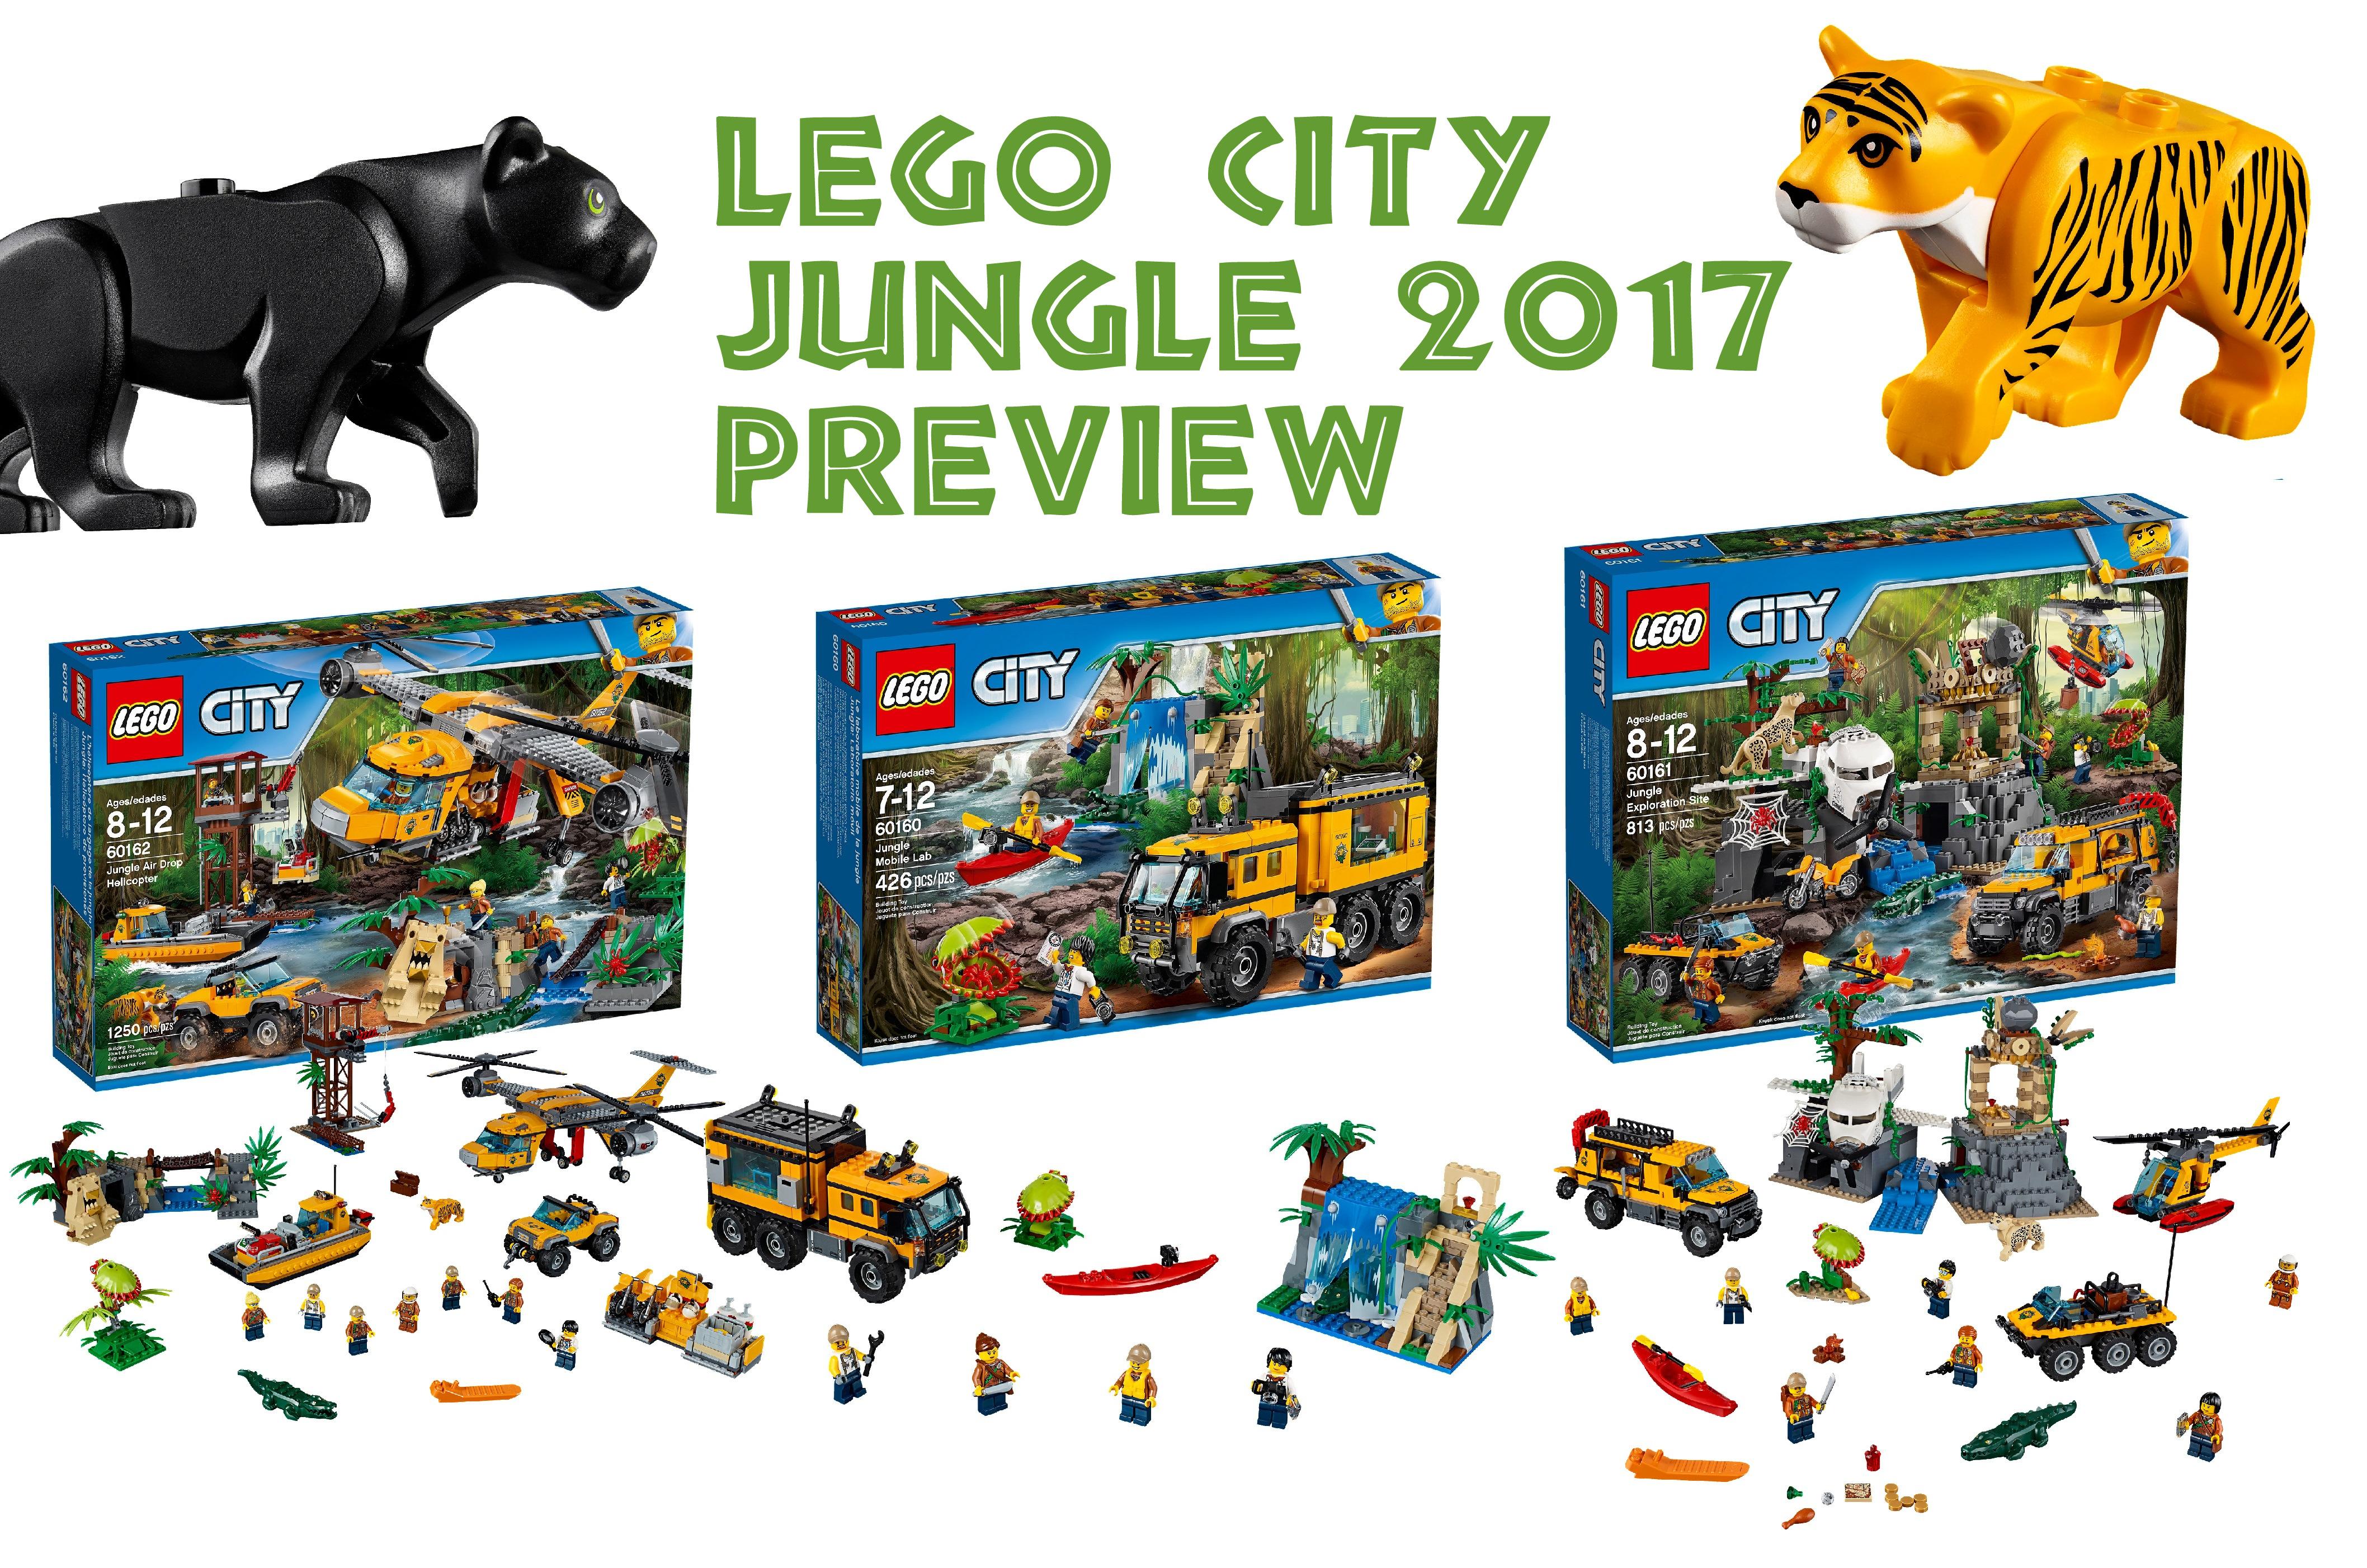 Preview: LEGO City Jungle 2017 sets - Jay's Brick Blog